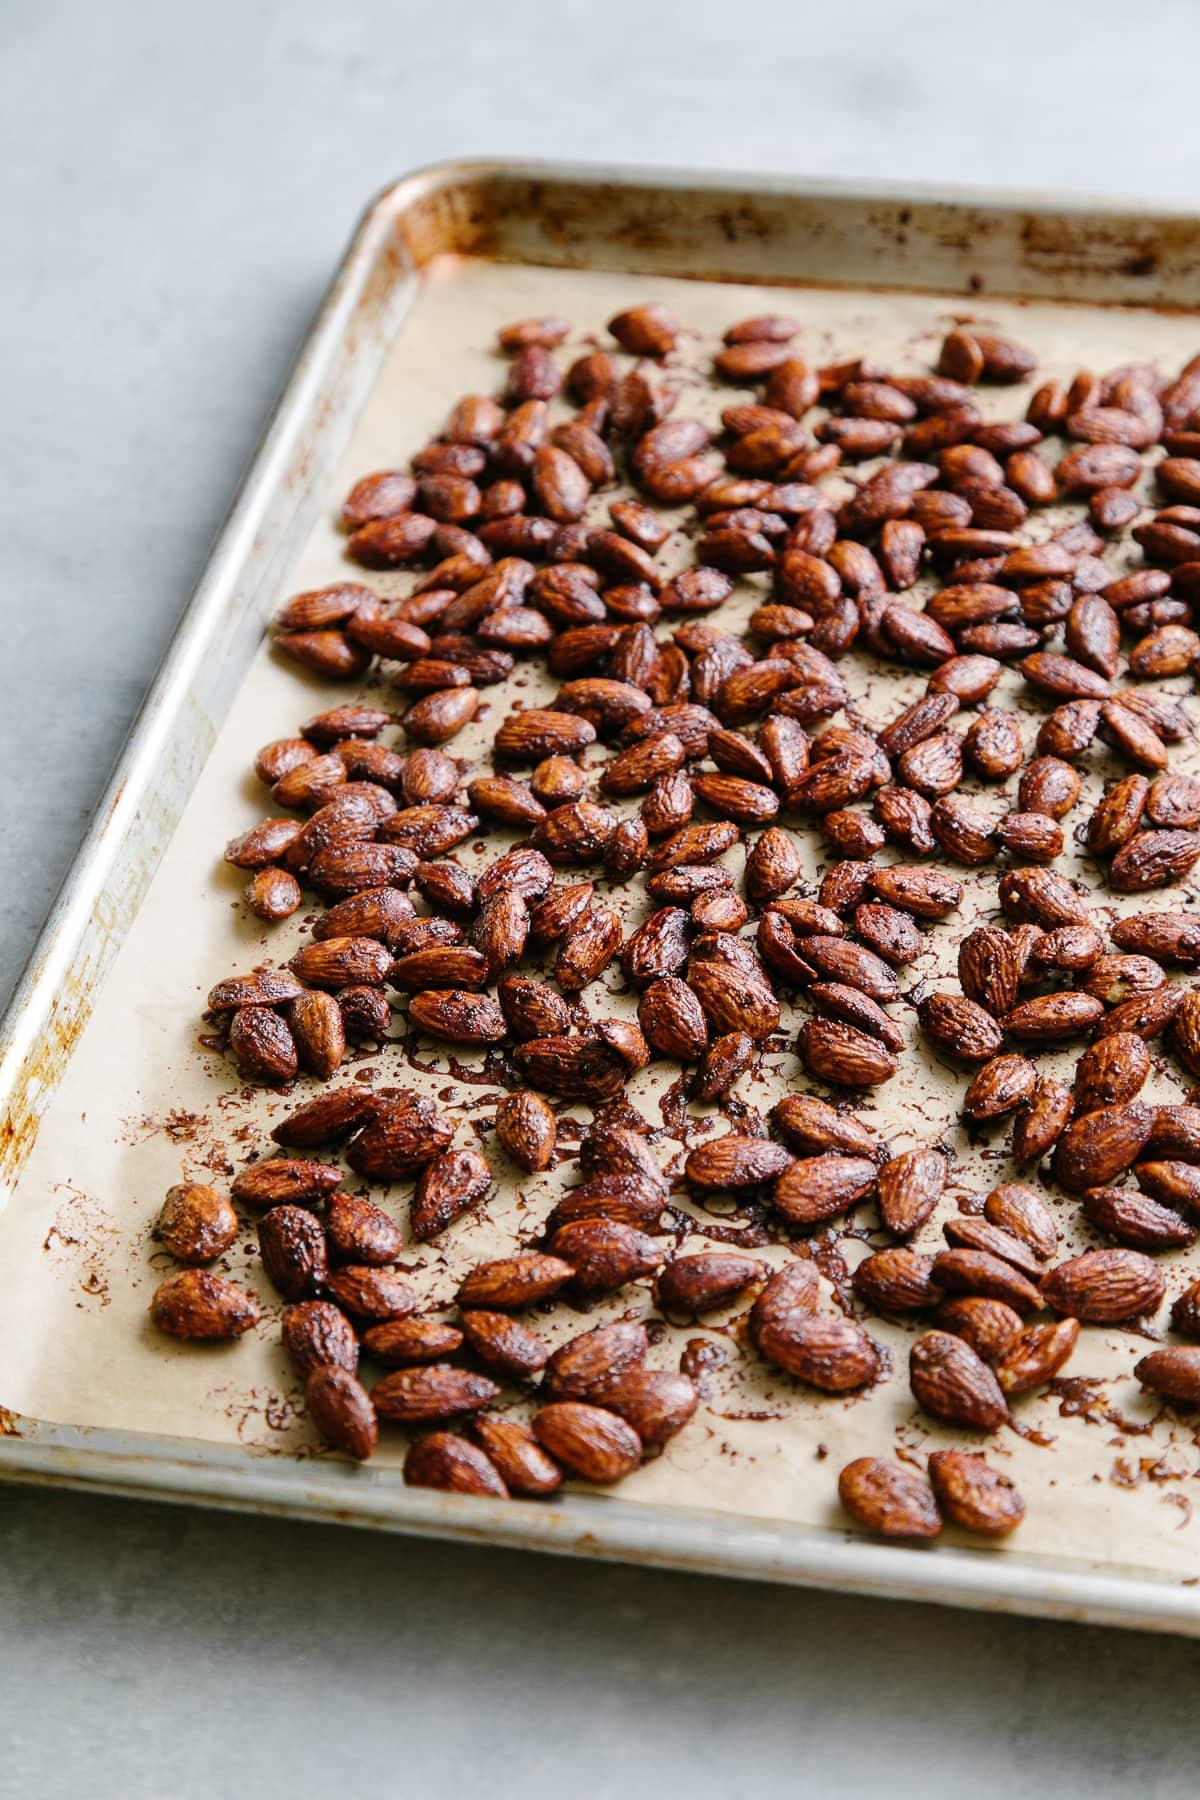 side angle view of freshly roasted almonds with chocolate chai glaze.